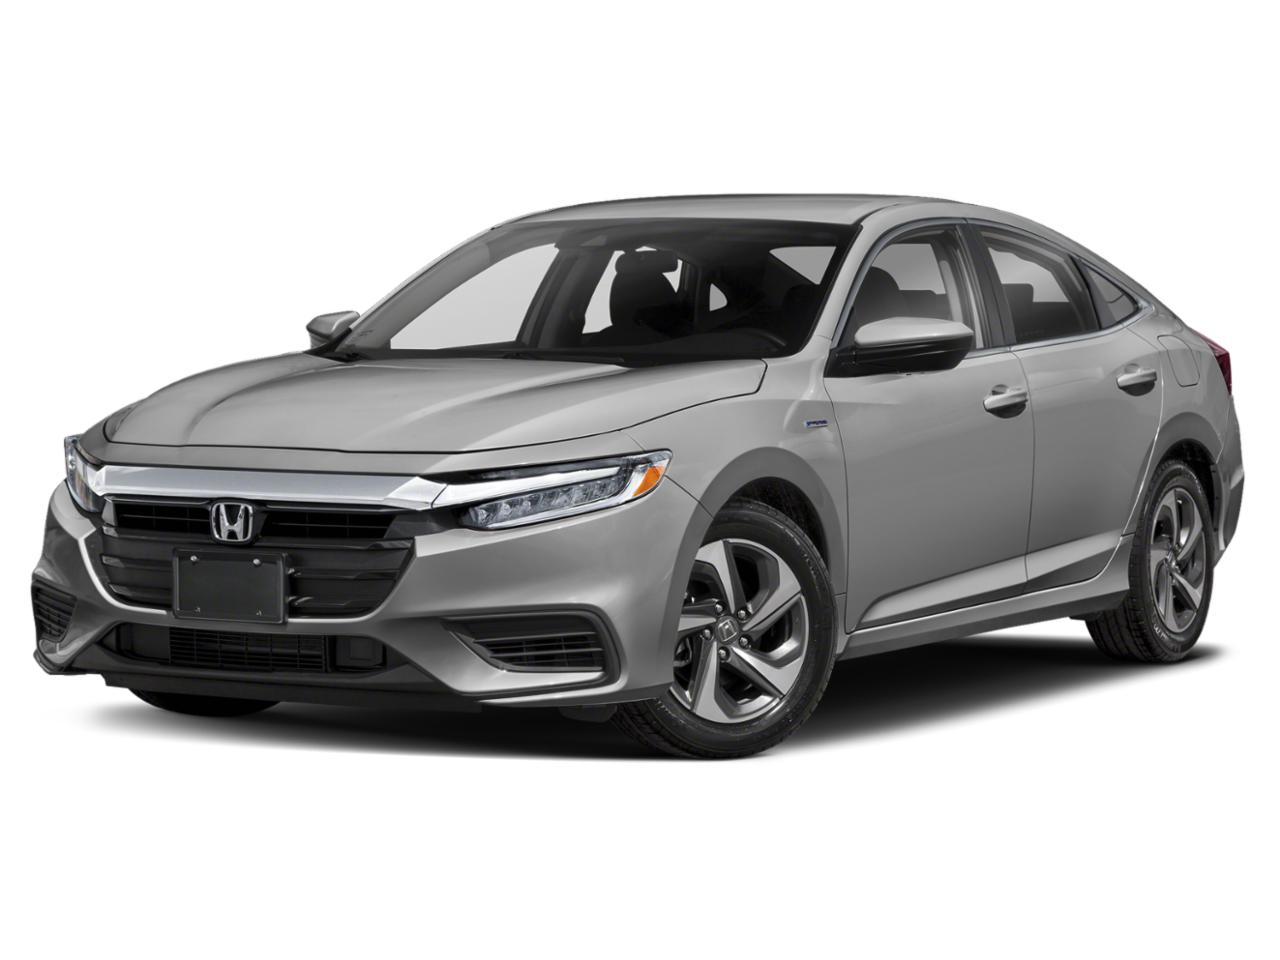 2019 Honda Insight Vehicle Photo in Appleton, WI 54913